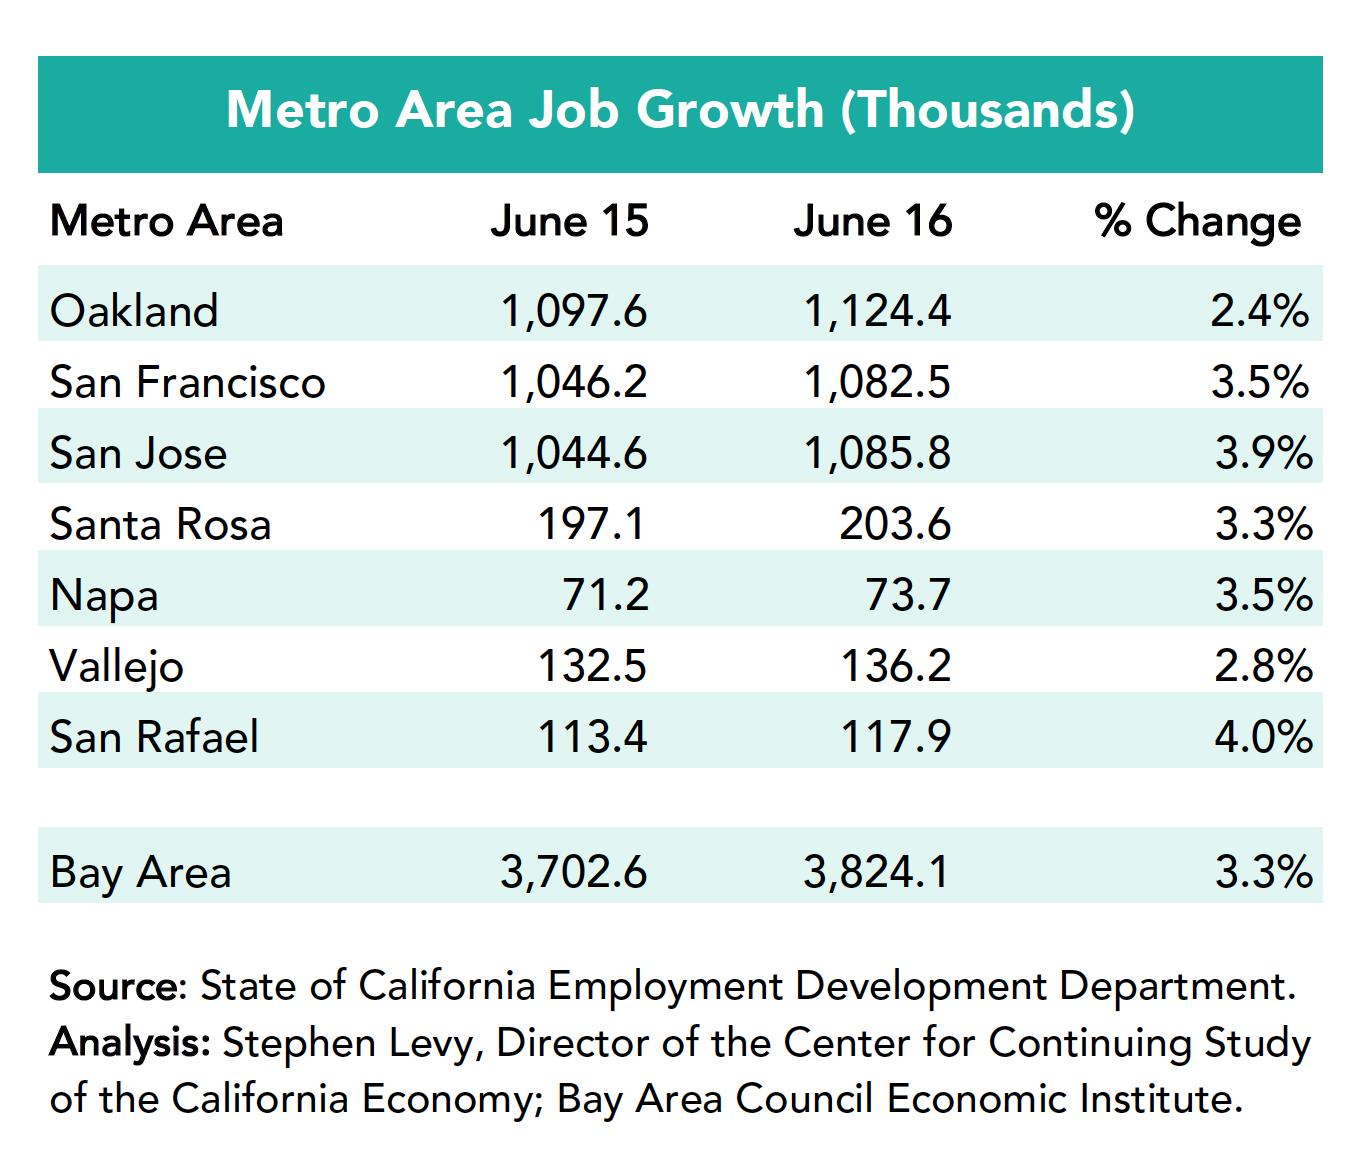 Metro Area Job Growth